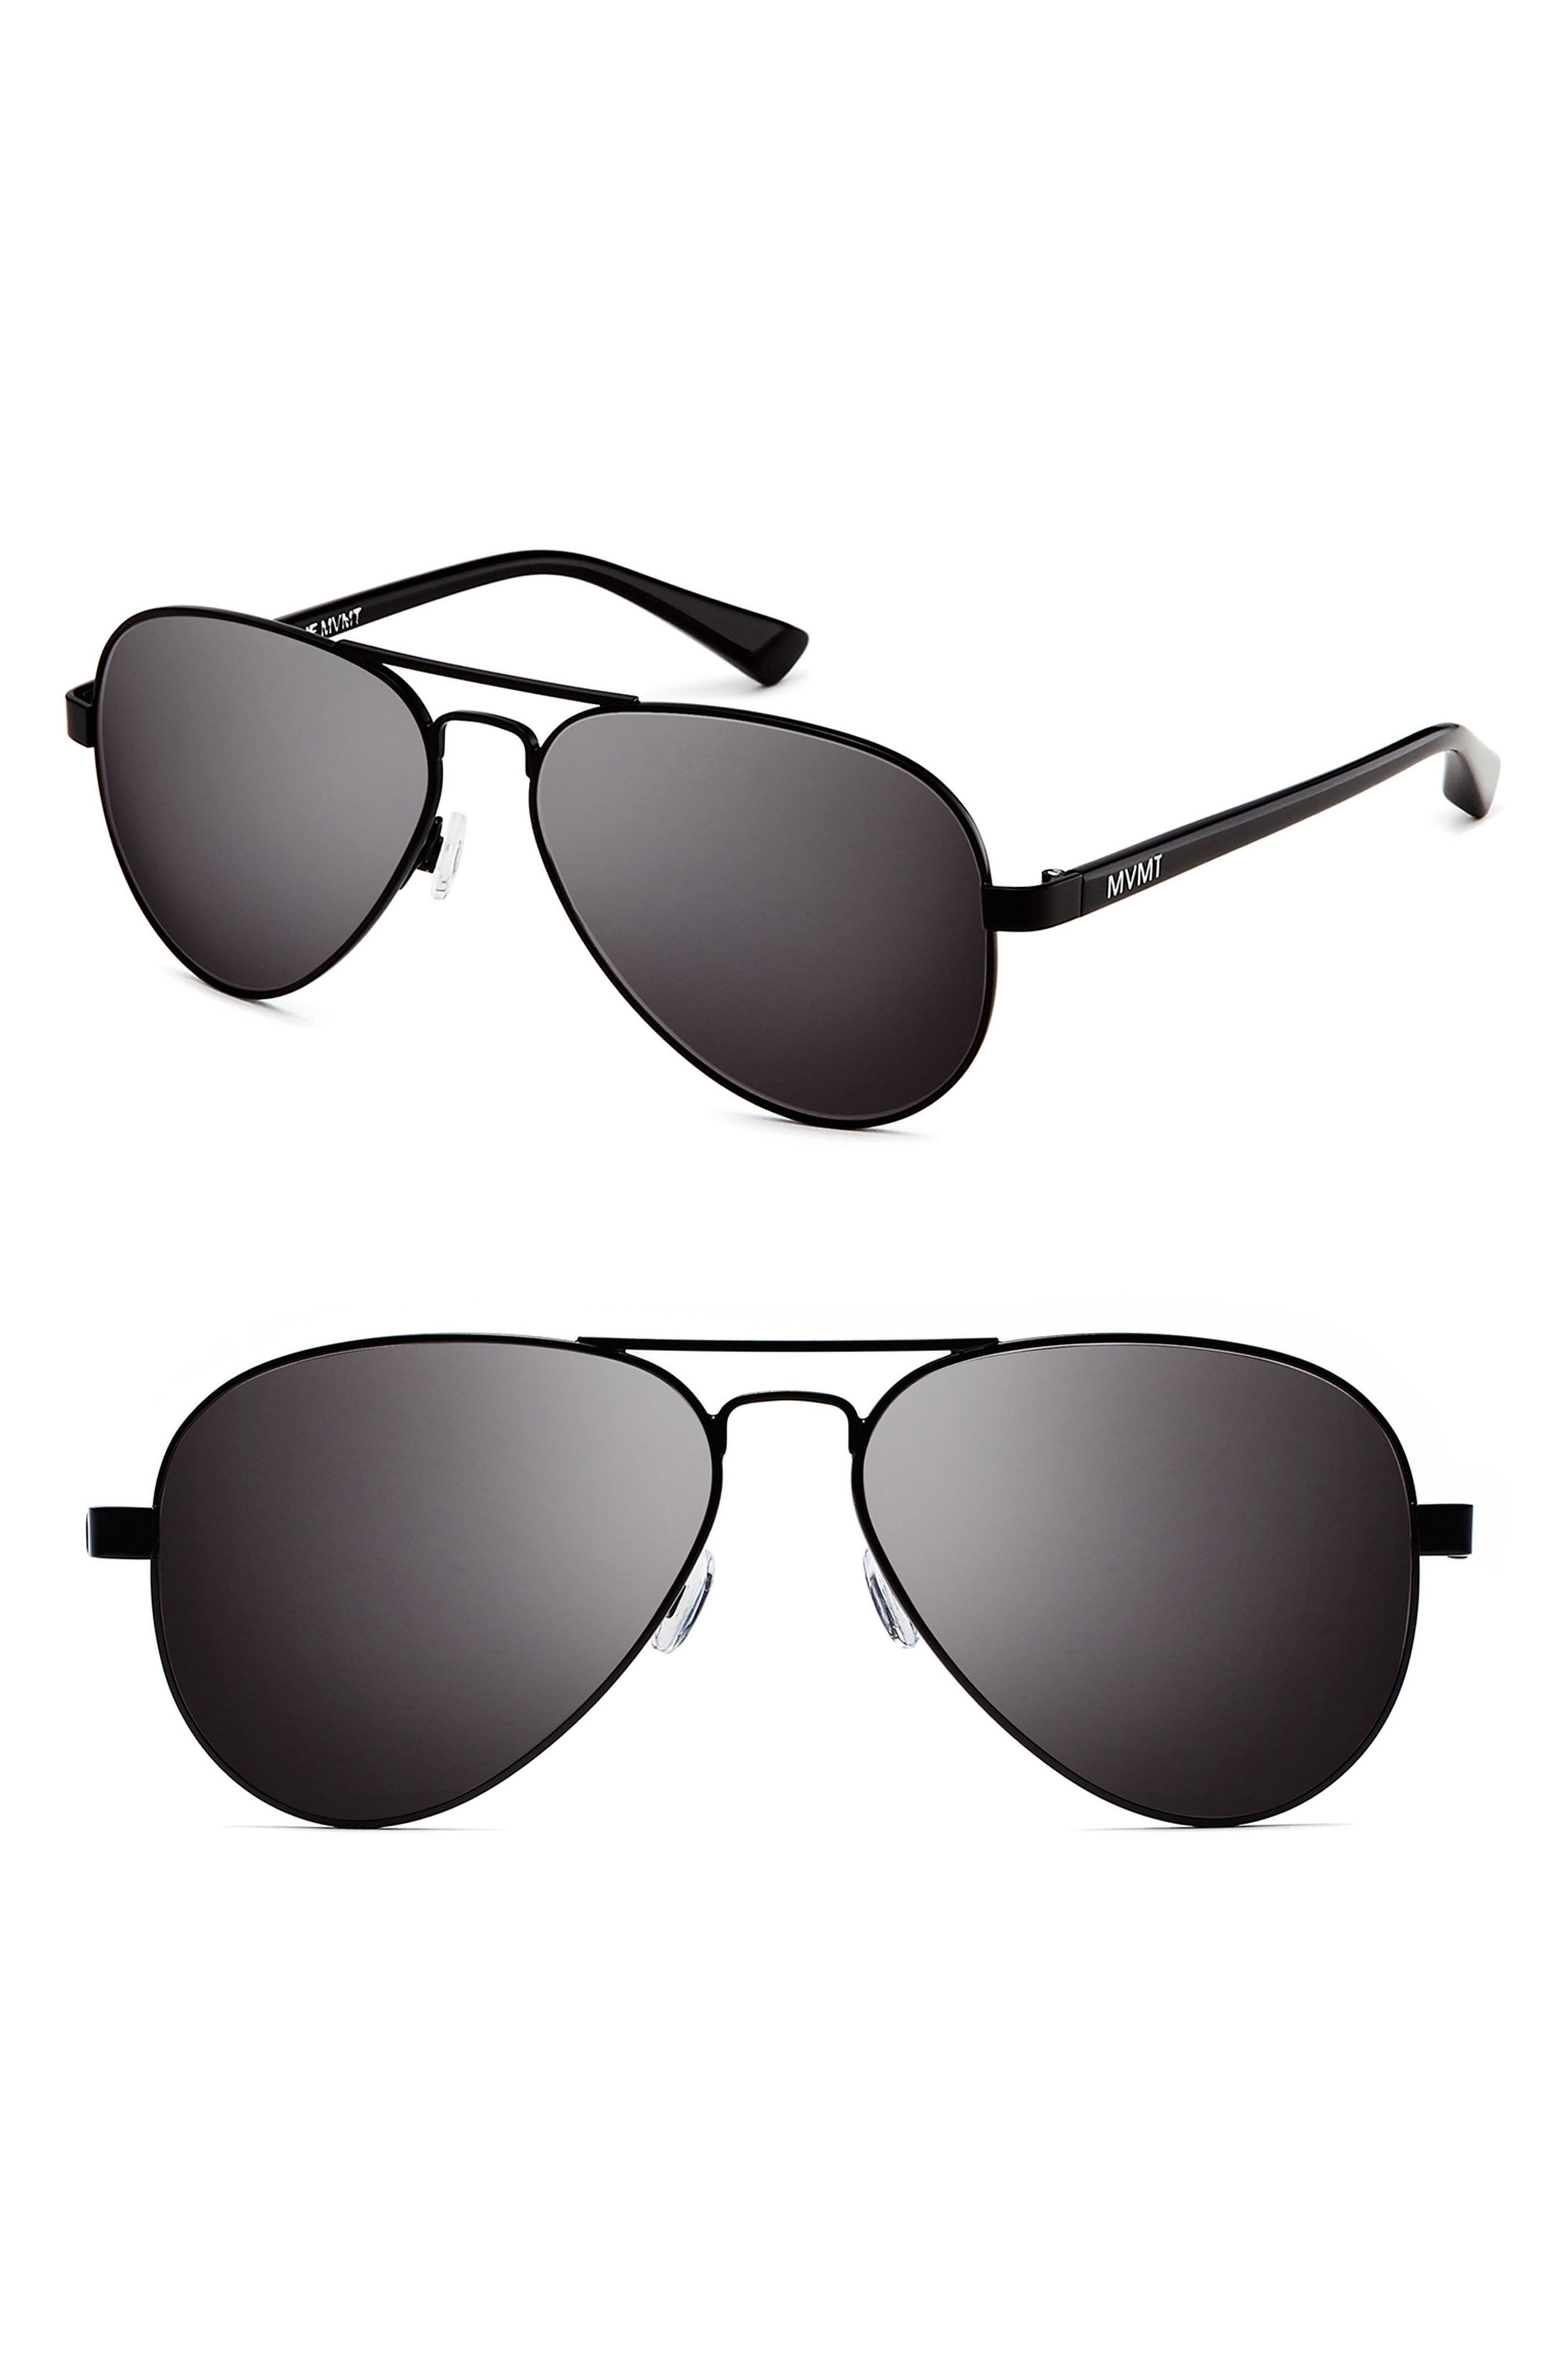 Runway 60mm Polarized Aviator Sunglasses,                             Main thumbnail 1, color,                             MATTE BLACK